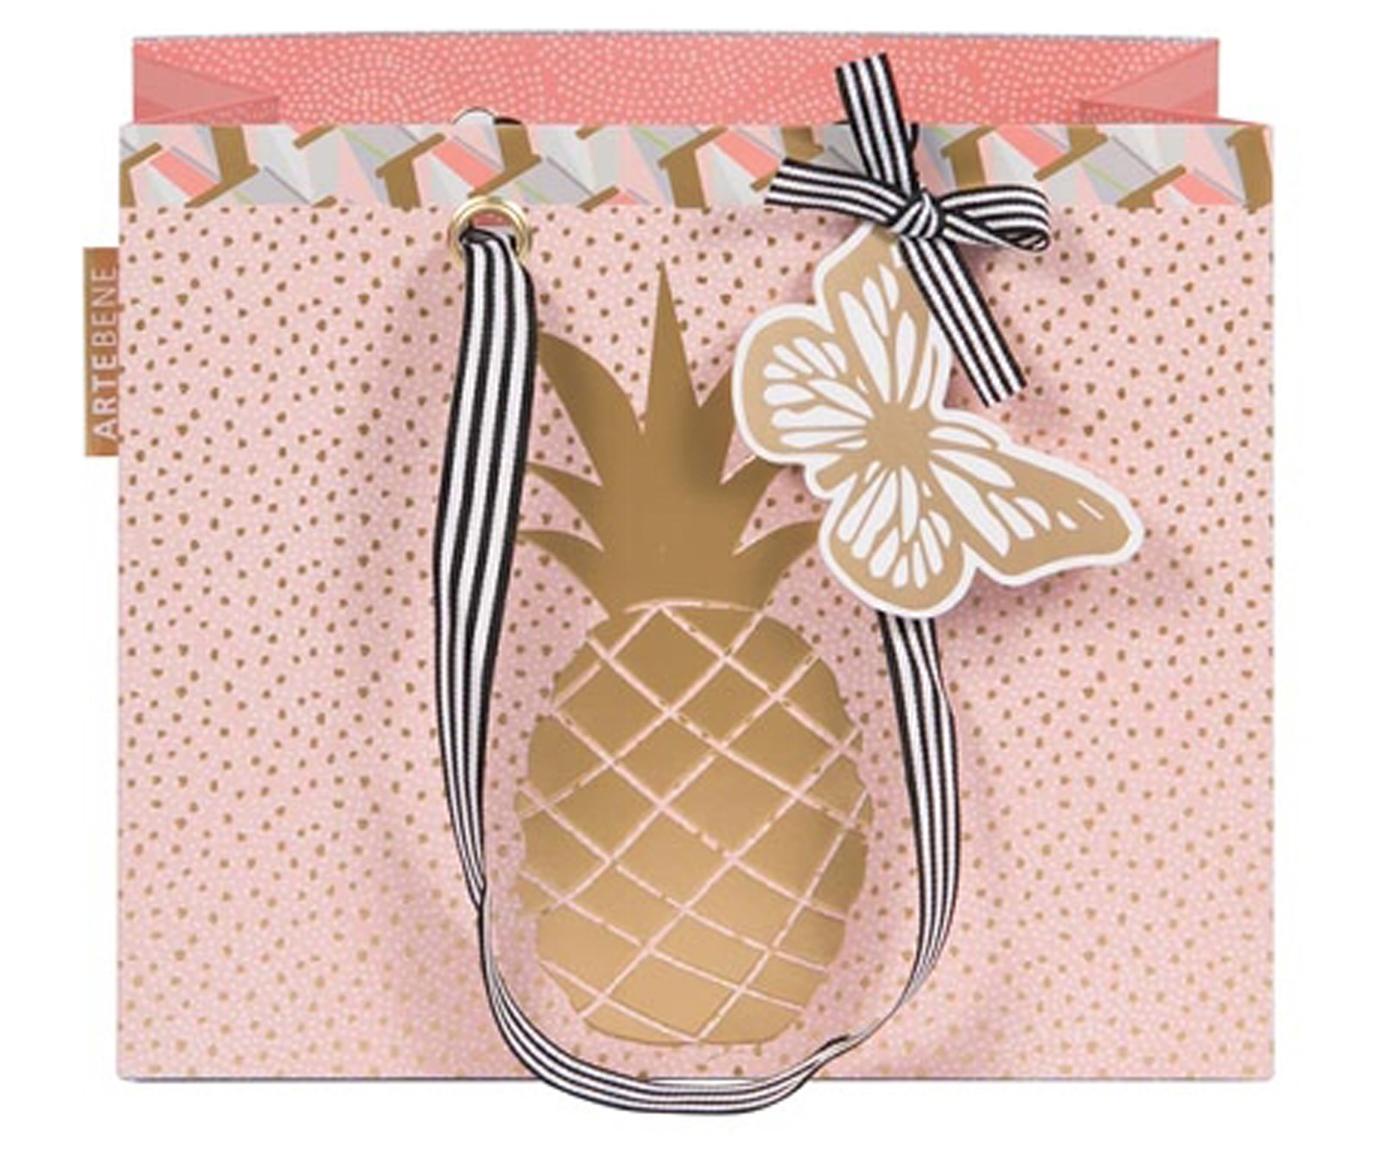 Sacchetto regalo Pineapple, Rosa, dorato, Larg. 22 x Alt. 18 cm